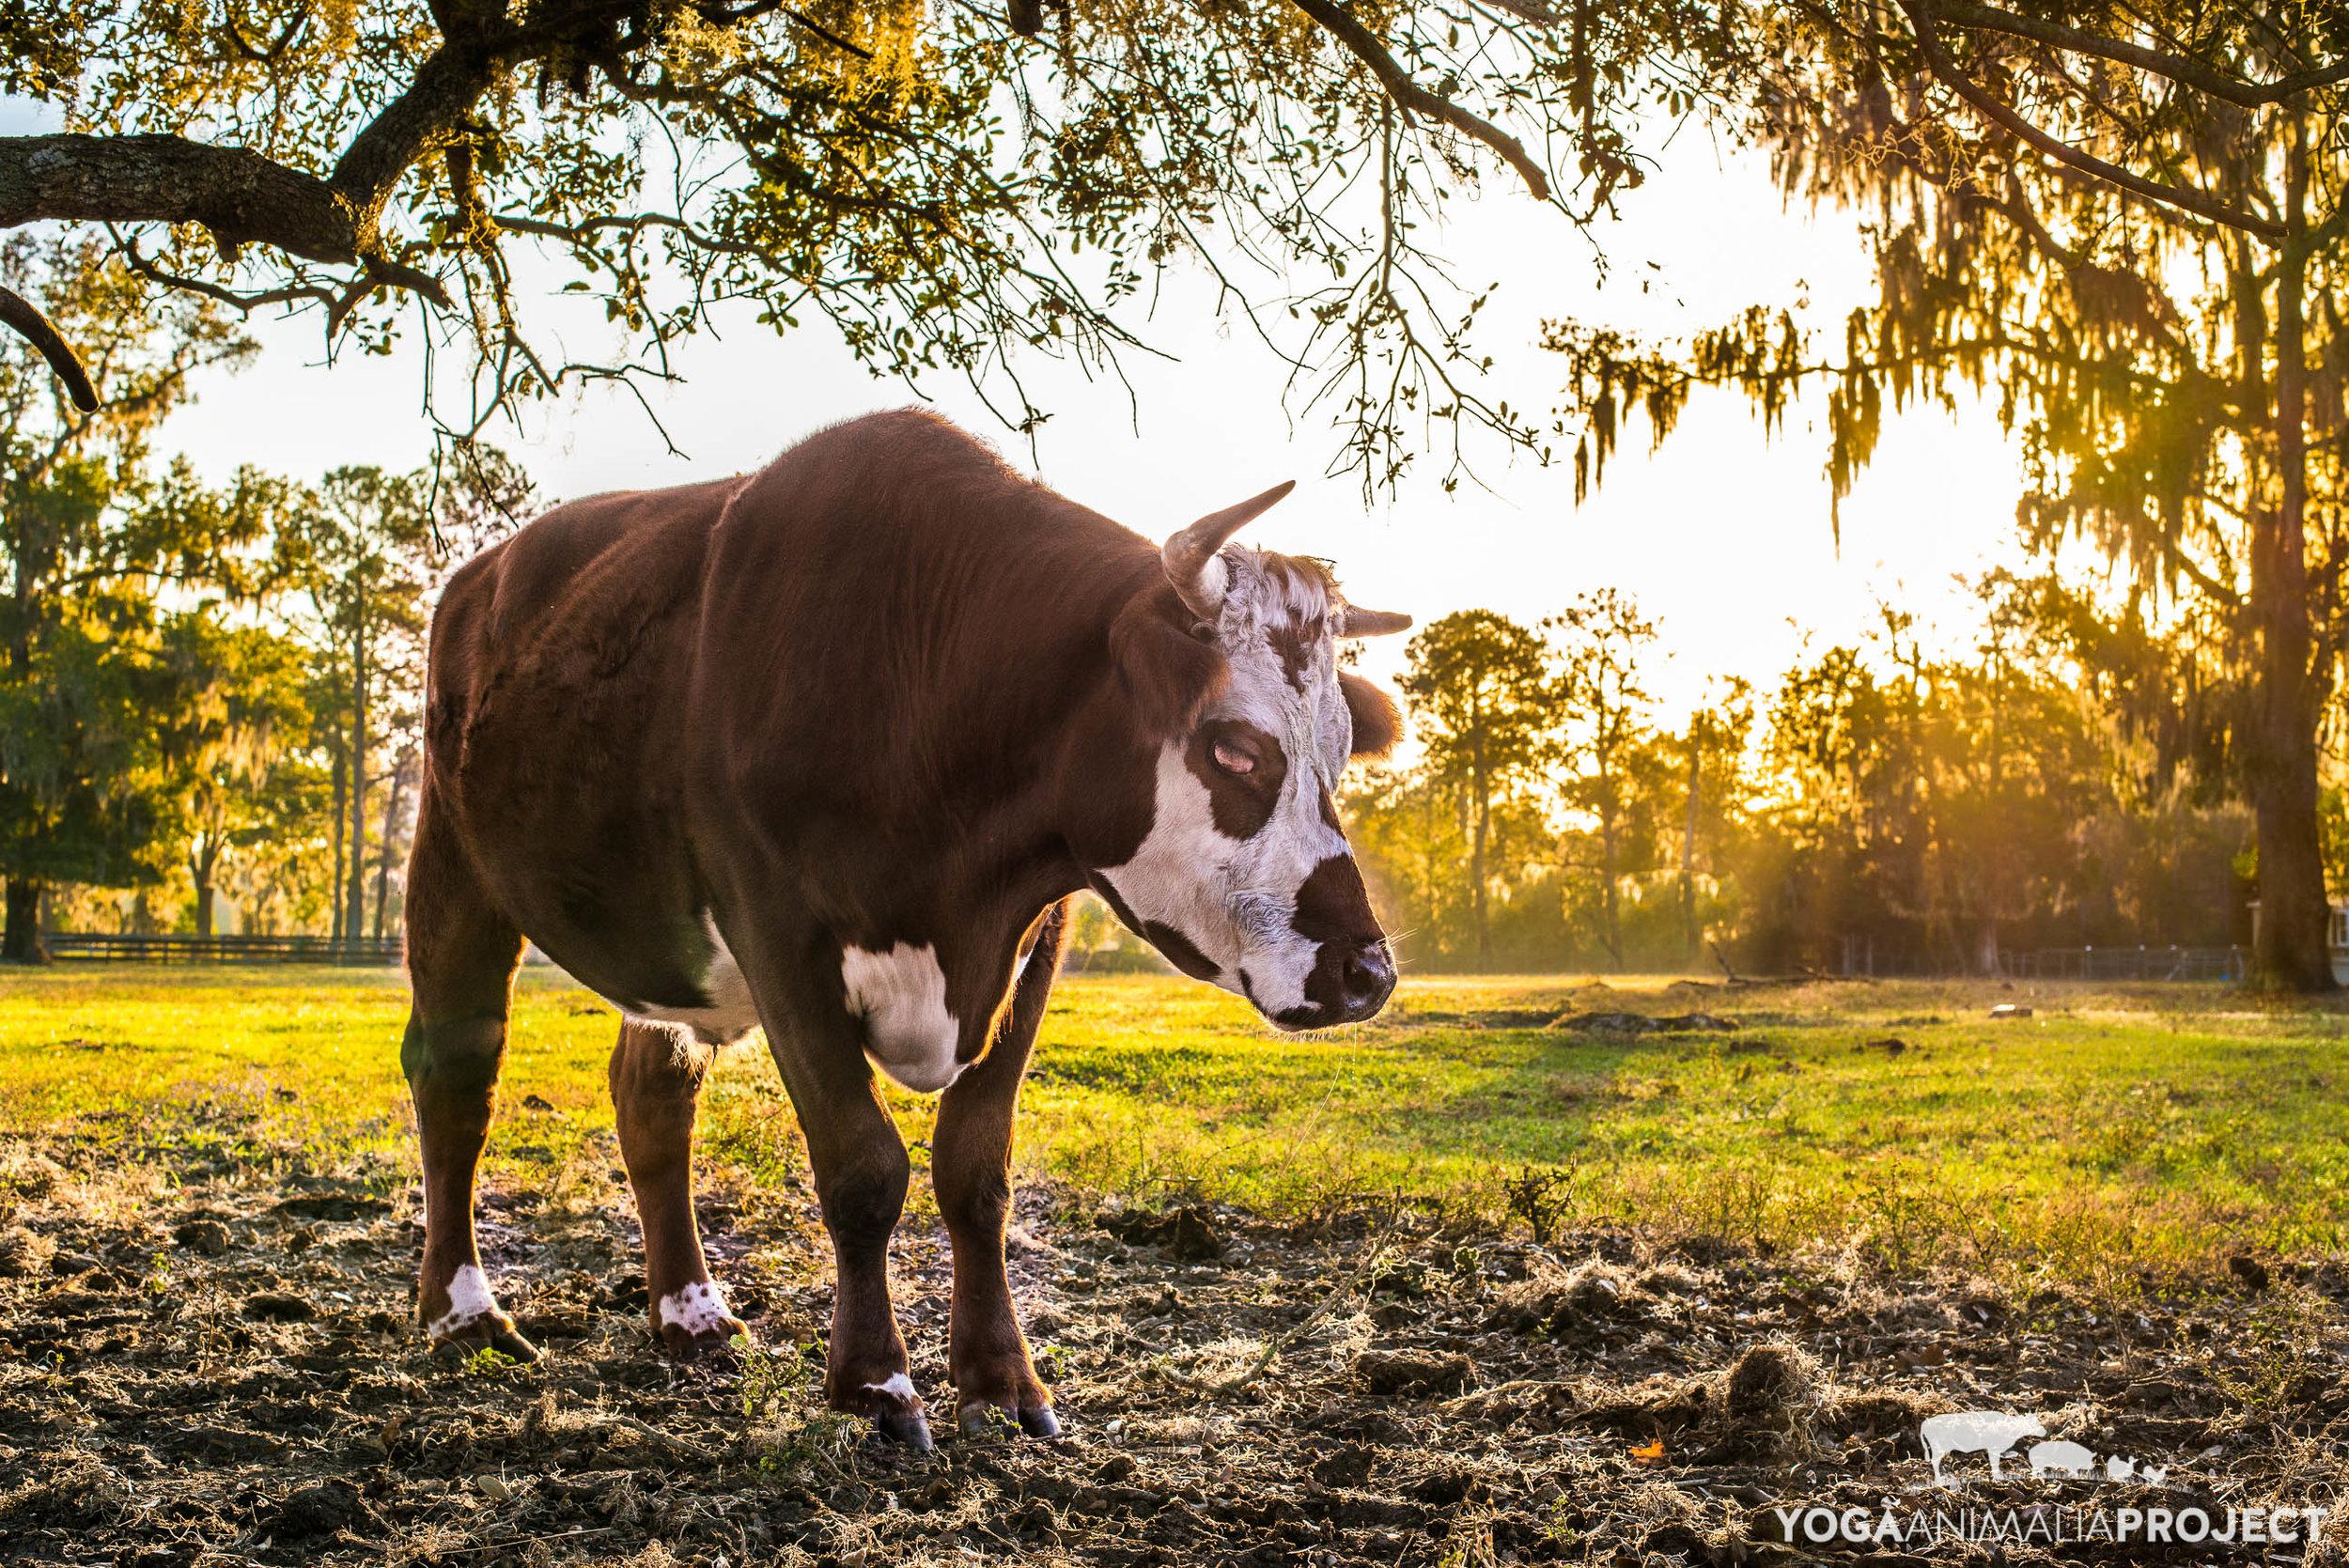 Yoga Animalia: Bovine -Owen, Kindred Spirits Sanctuary, Ocala, Florida